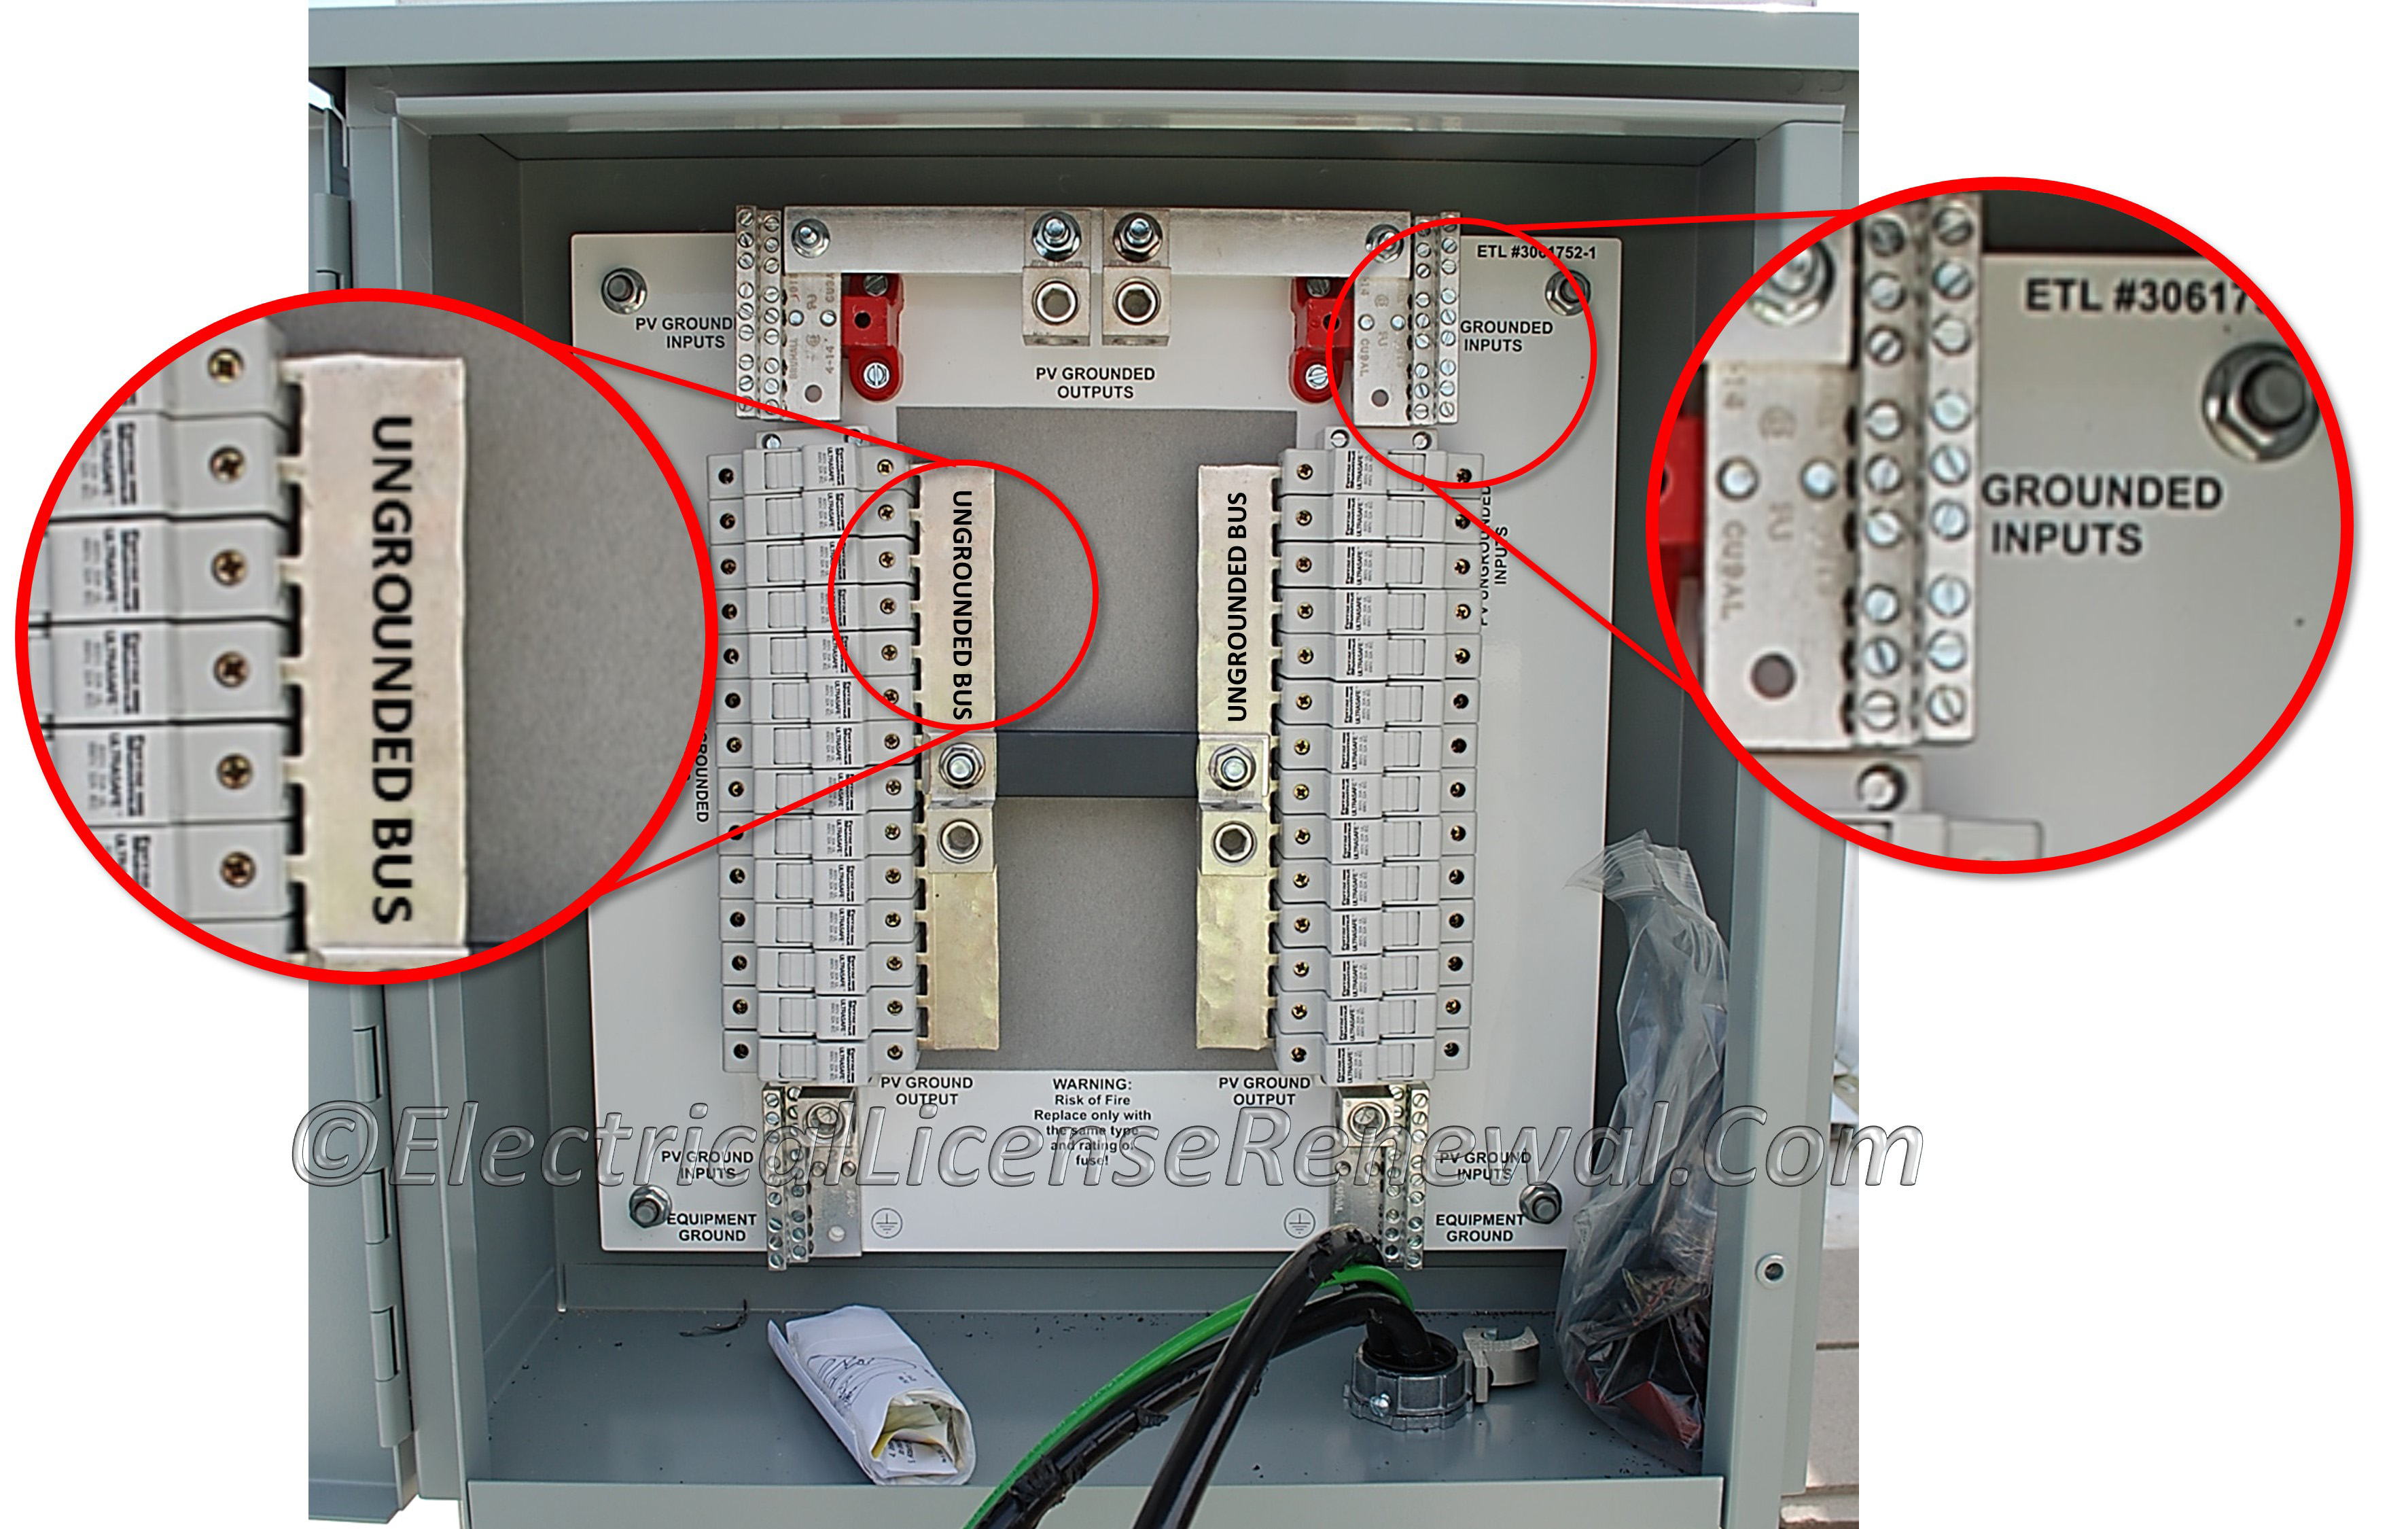 Busses Electrical Fuse Box Wiring Diagrams Bus 408 3e2 Dc Arrangement Household